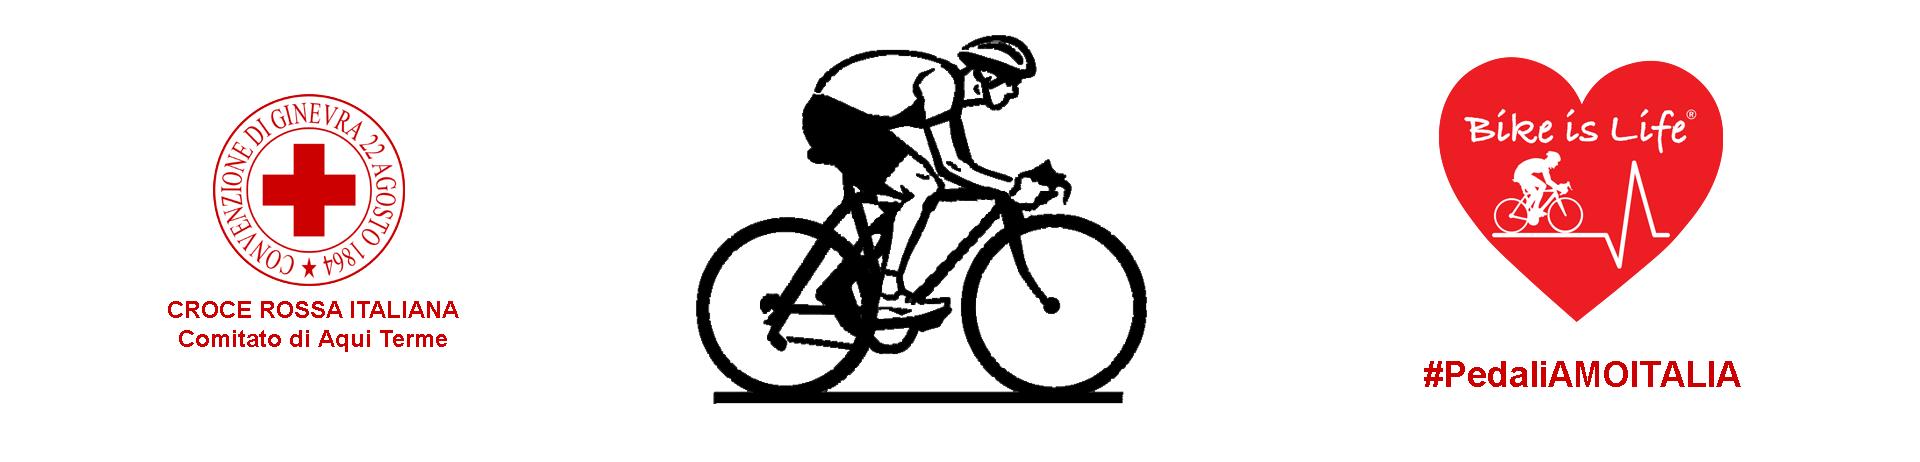 Croce Rossa in Bici. 7 Principi per 200 km: Torino-Solferino 2021